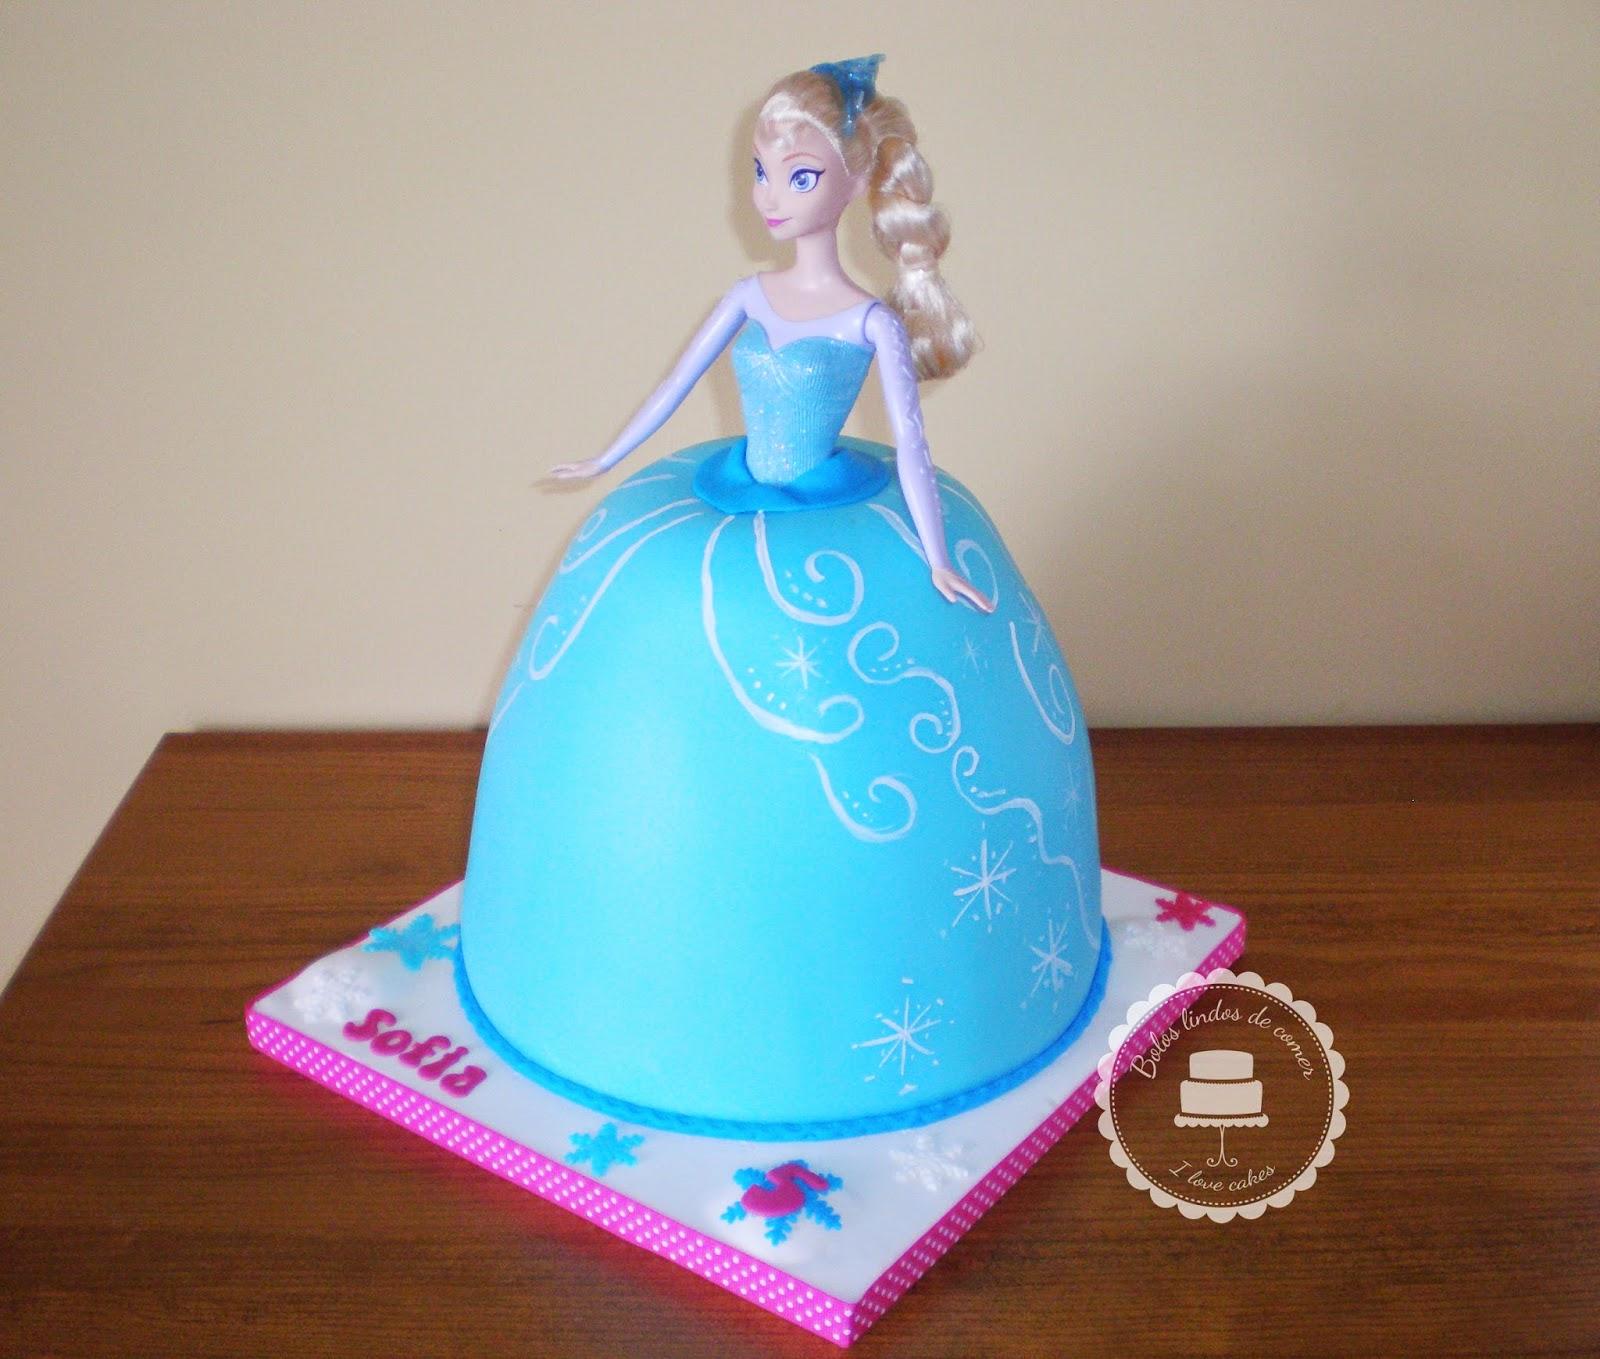 frozen birthday cake edible image 16 on frozen birthday cake edible image